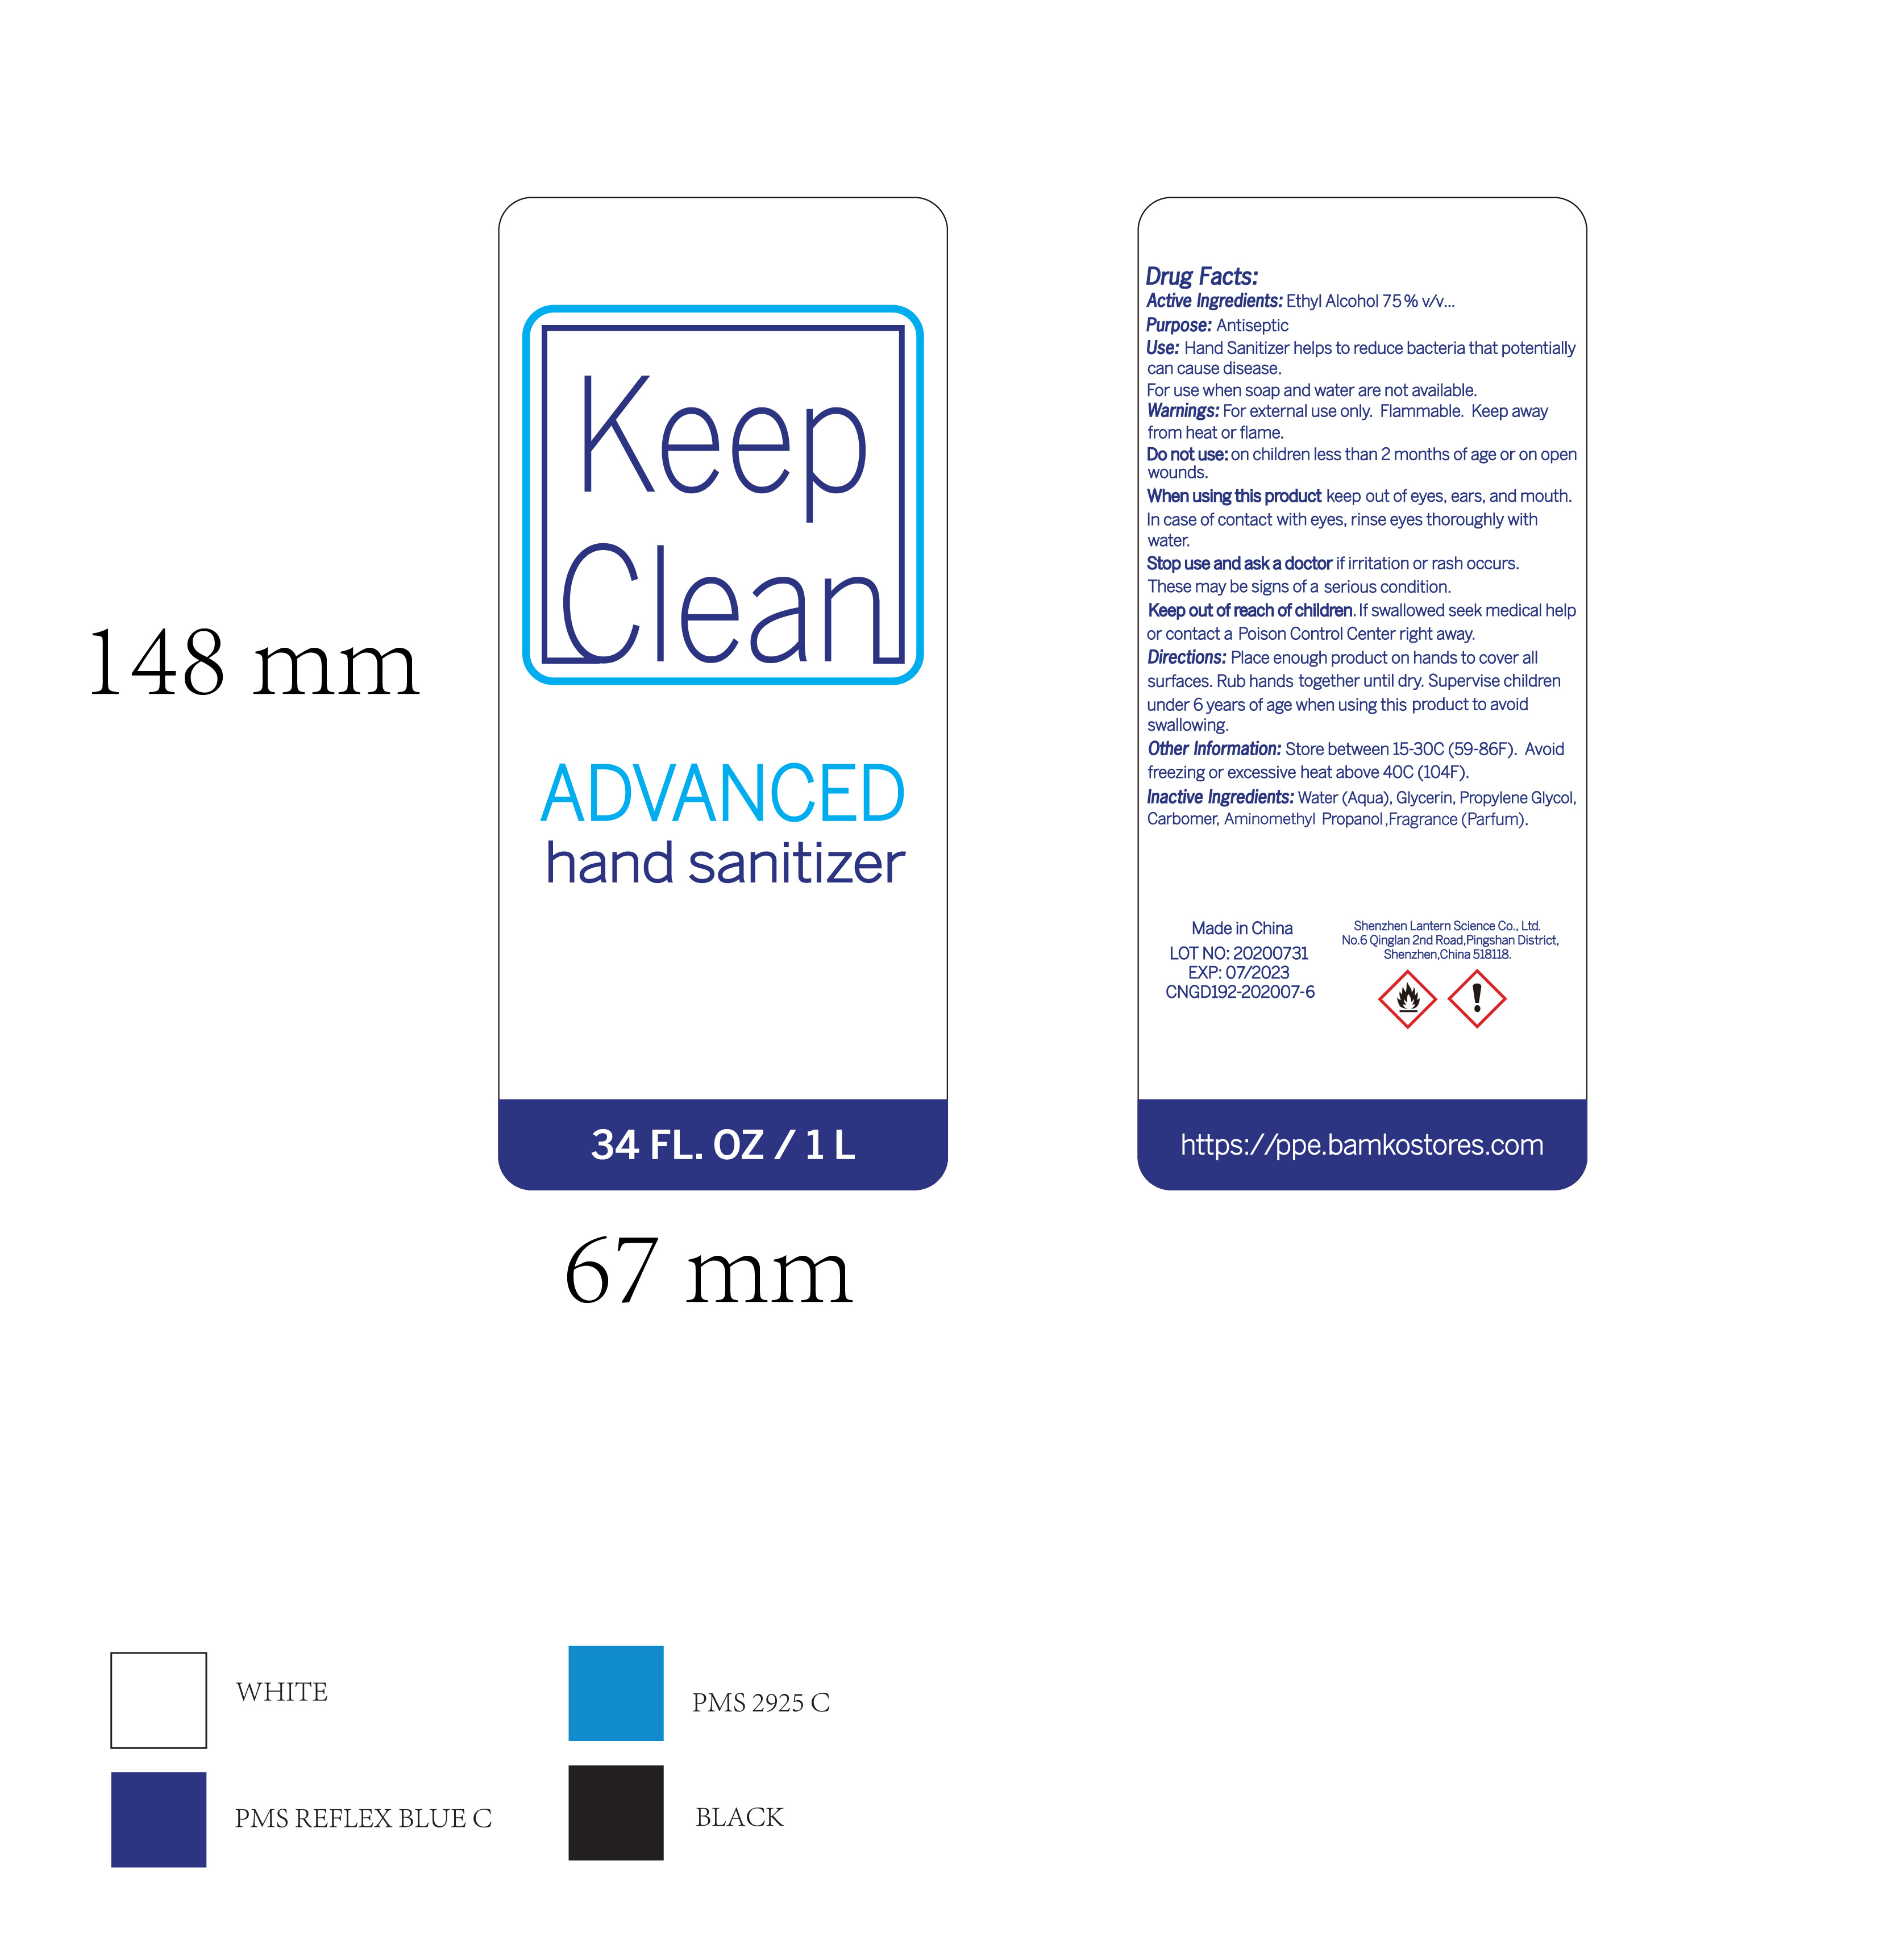 Keep clean hand sanitizer 1L